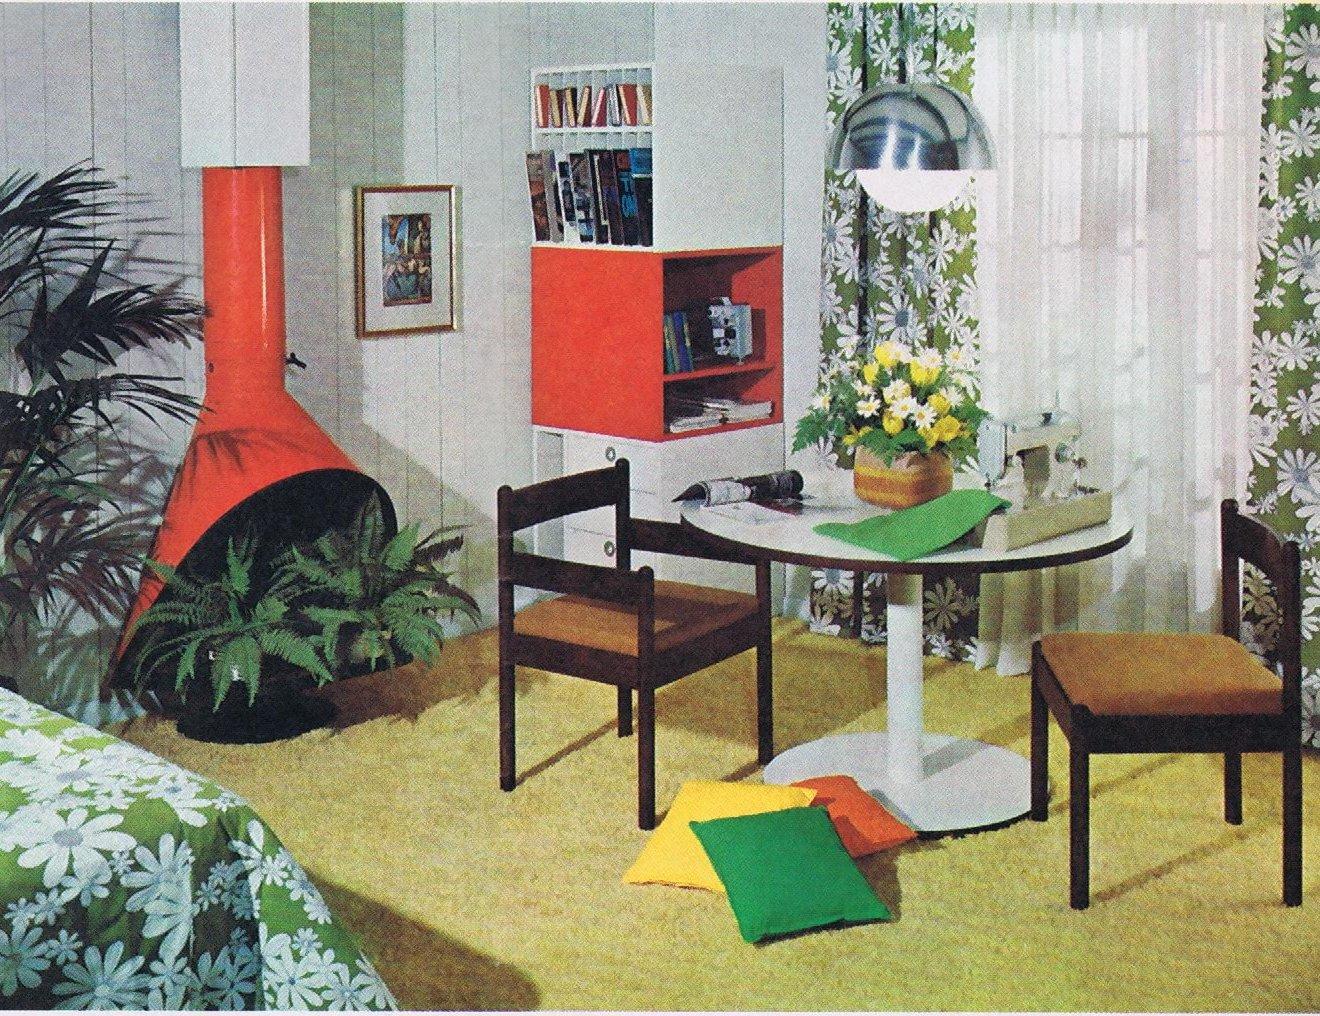 1000 images about mod vintage home decor on pinterest